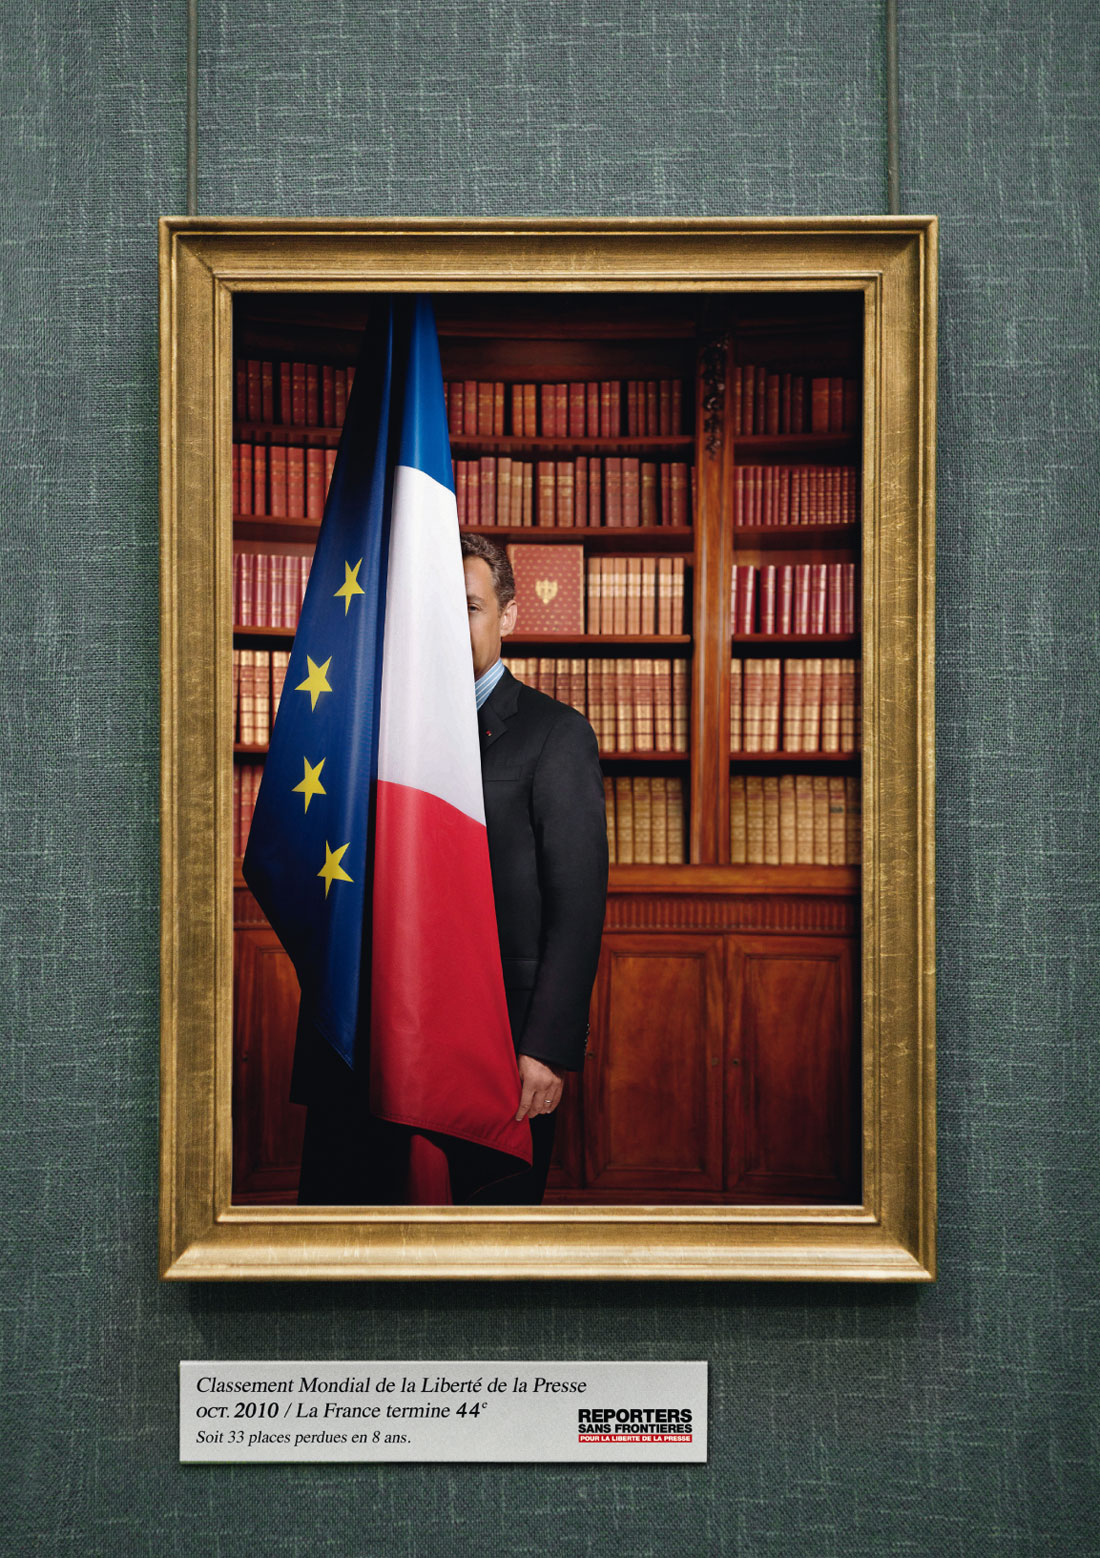 La France maltraite la liberté de la presse